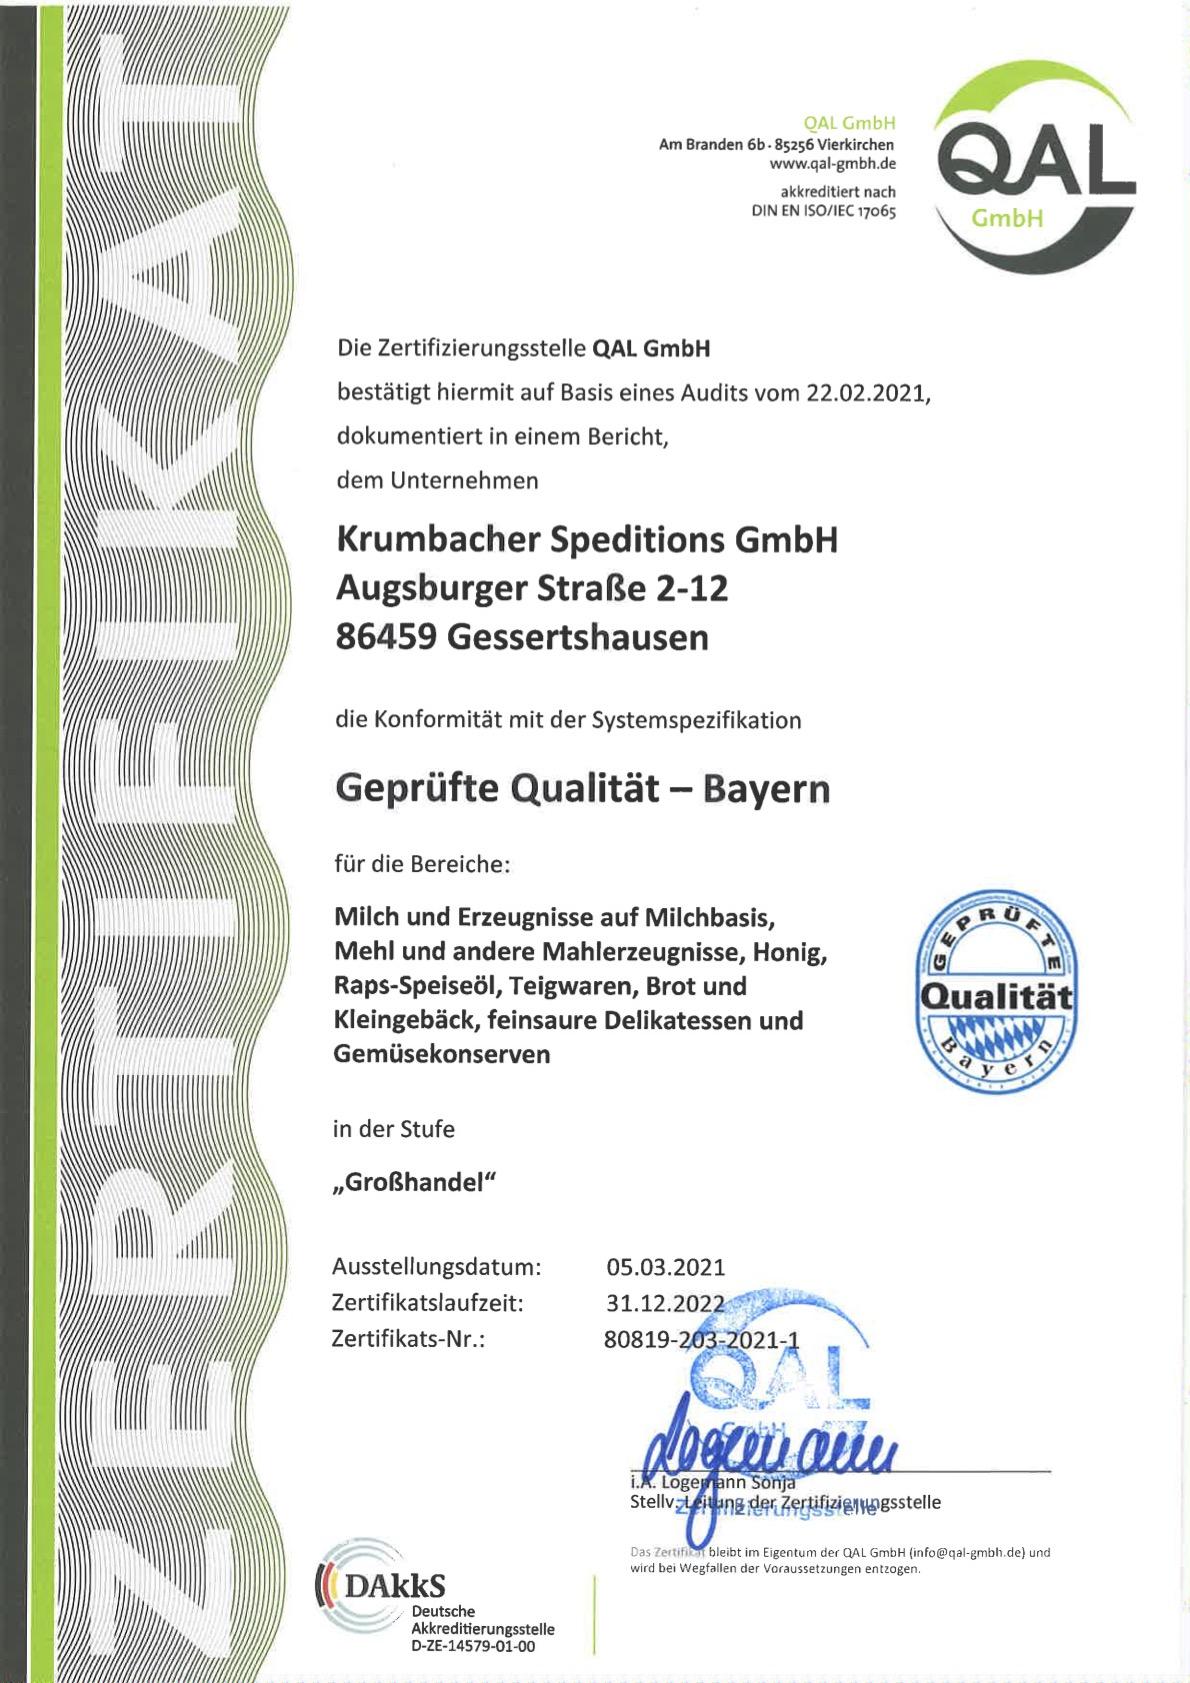 zertifikat-gq-gessertshausen